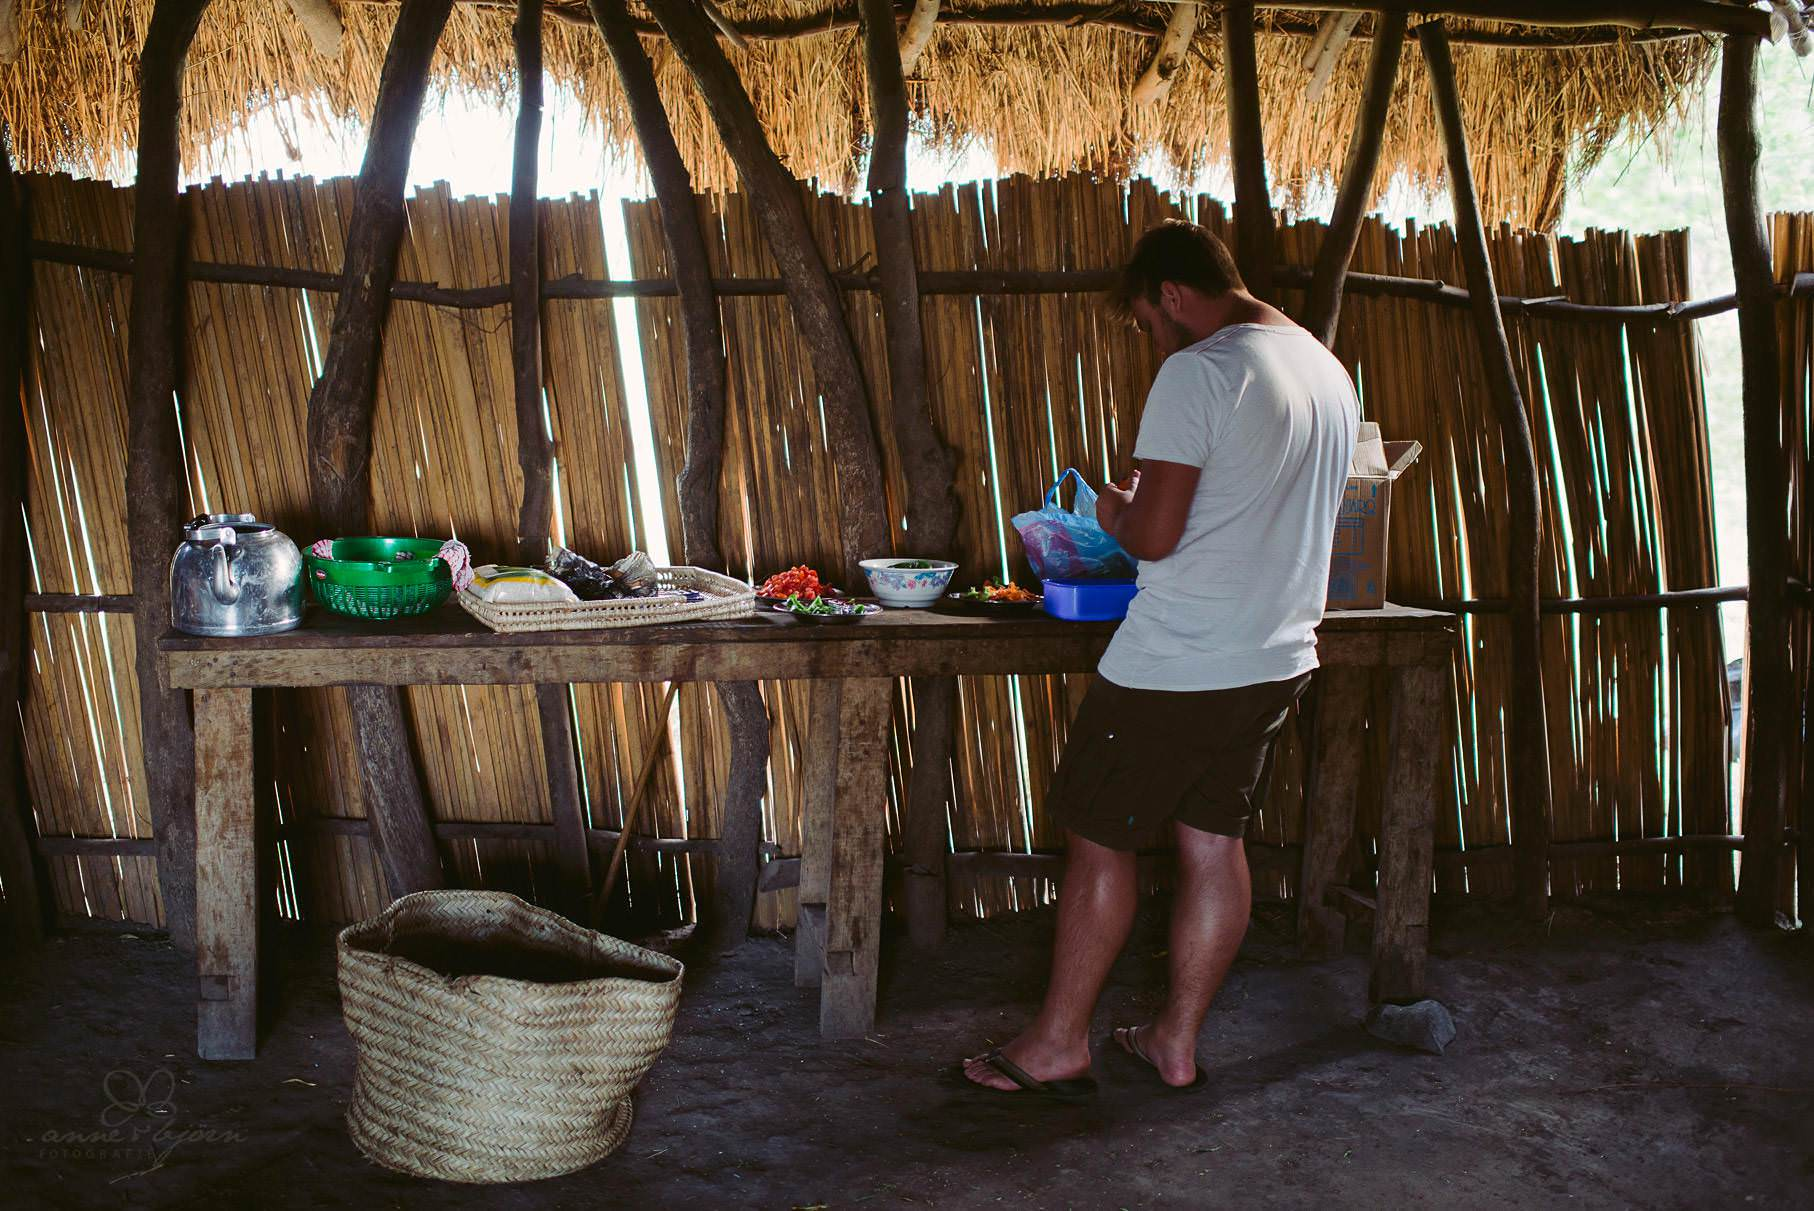 0019 tansania nd8 9689 anne bjoern fotografie hochzeitsfotograf hamburg - This is Tanzania - Serengeti, Kilimanjaro & Sansibar